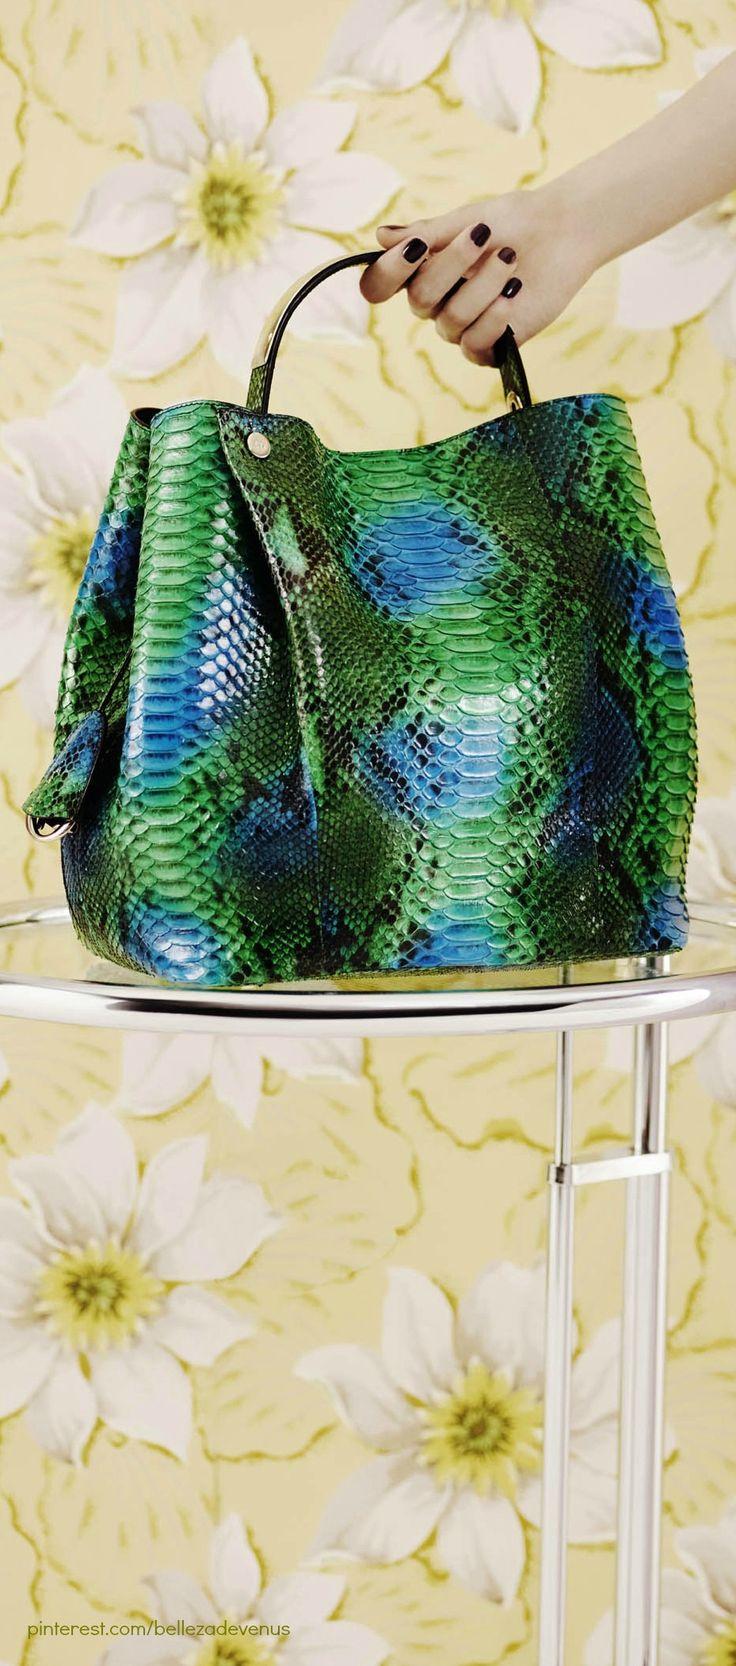 137 Best Purseshandbagsluggage Images On Pinterest Couture Nucelle Women Leather Purse Satchel Shoulder Bag Handbag Lock Gorgeous Glitter Elegant Blue Dior 2014 A Must Haveeee